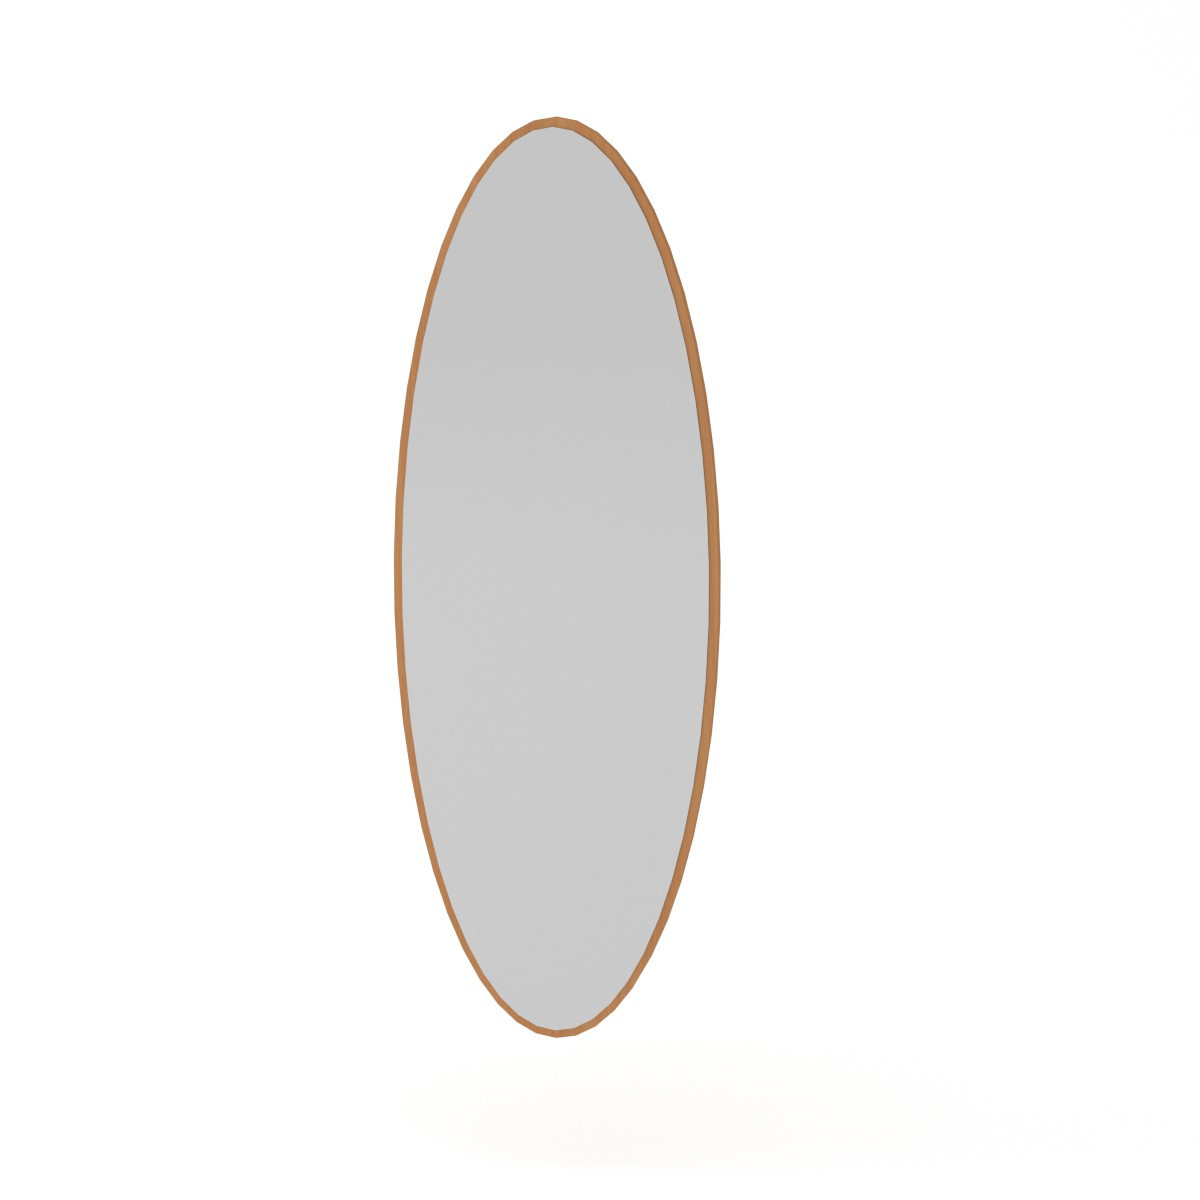 Зеркало-1 бук Компанит